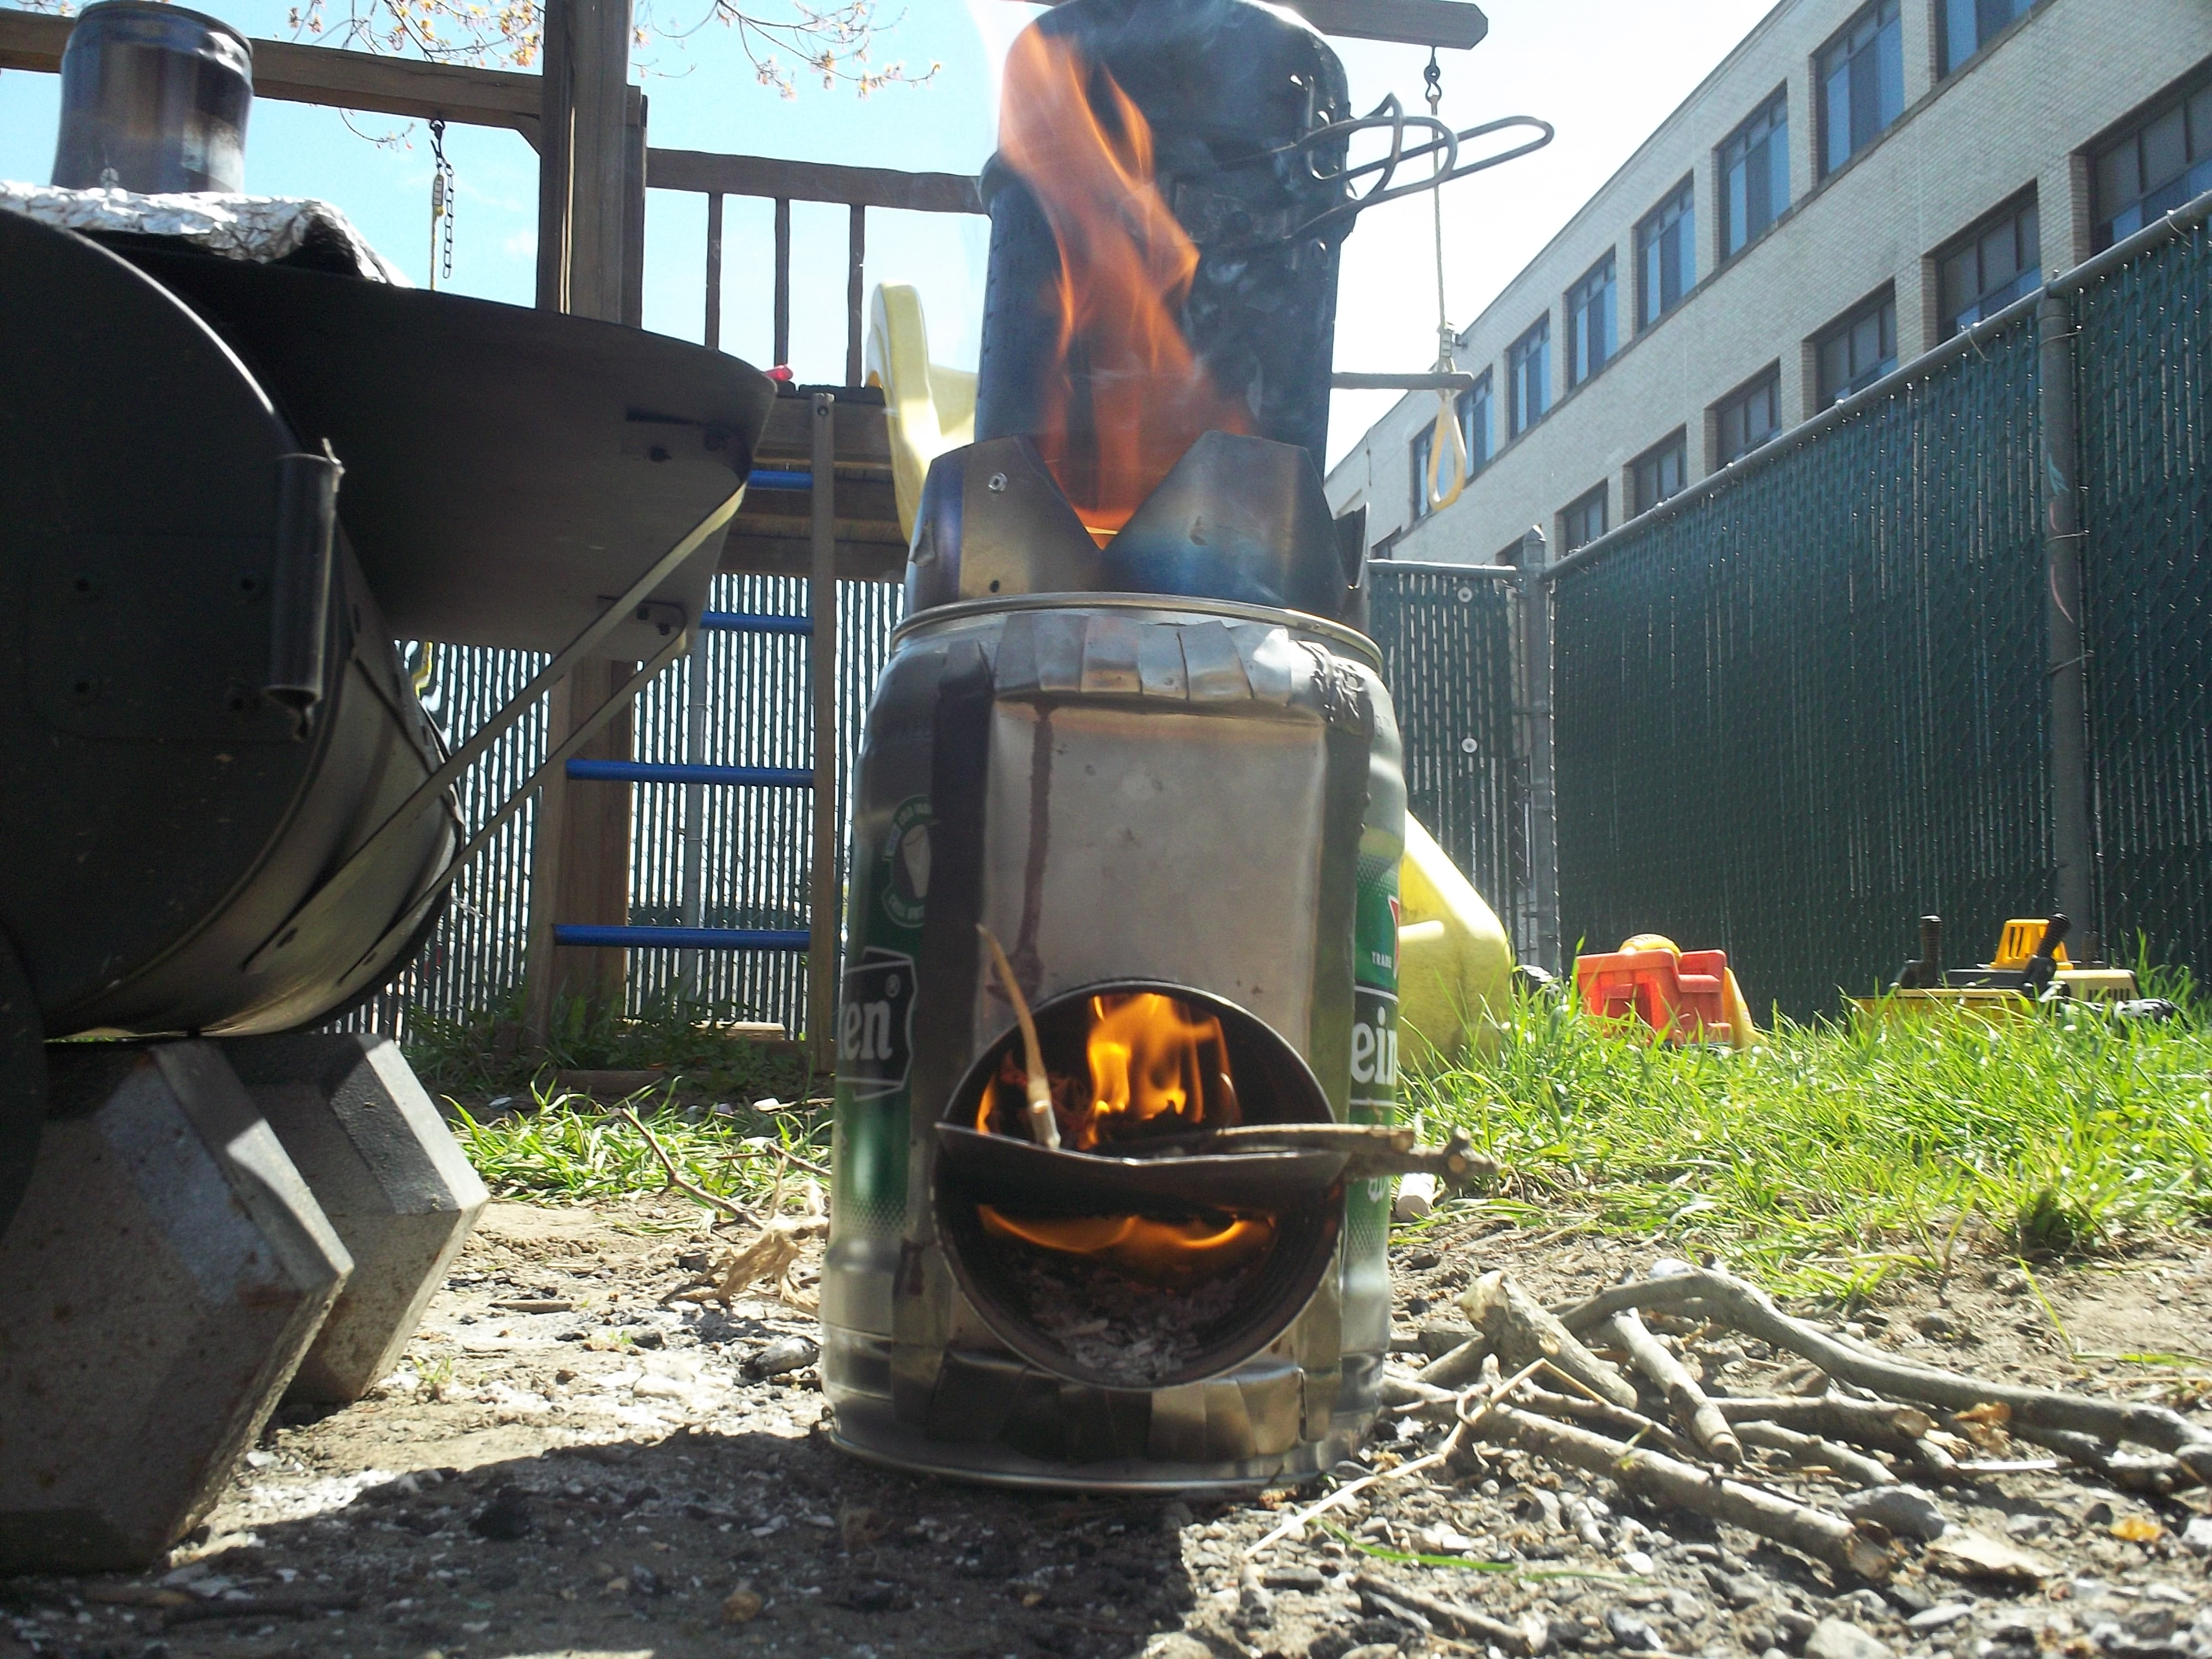 heiny keg rocket stove nagginginspiration